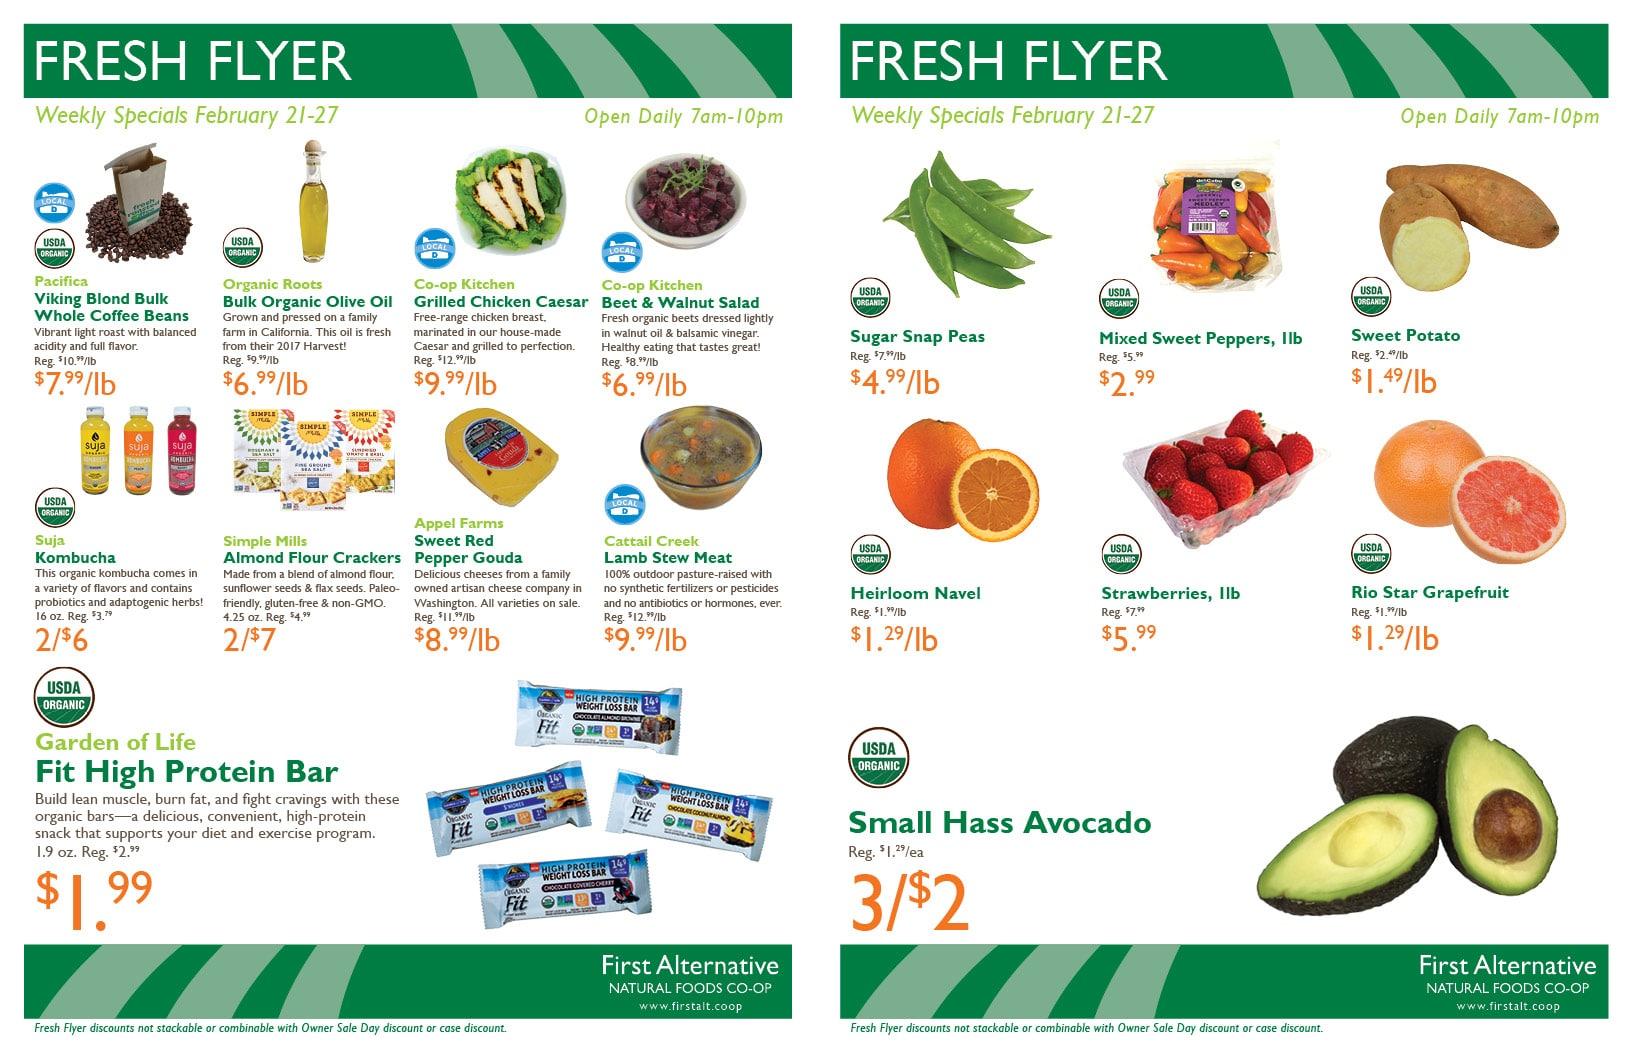 First Alternative Co-op Fresh Flyer February 21-27